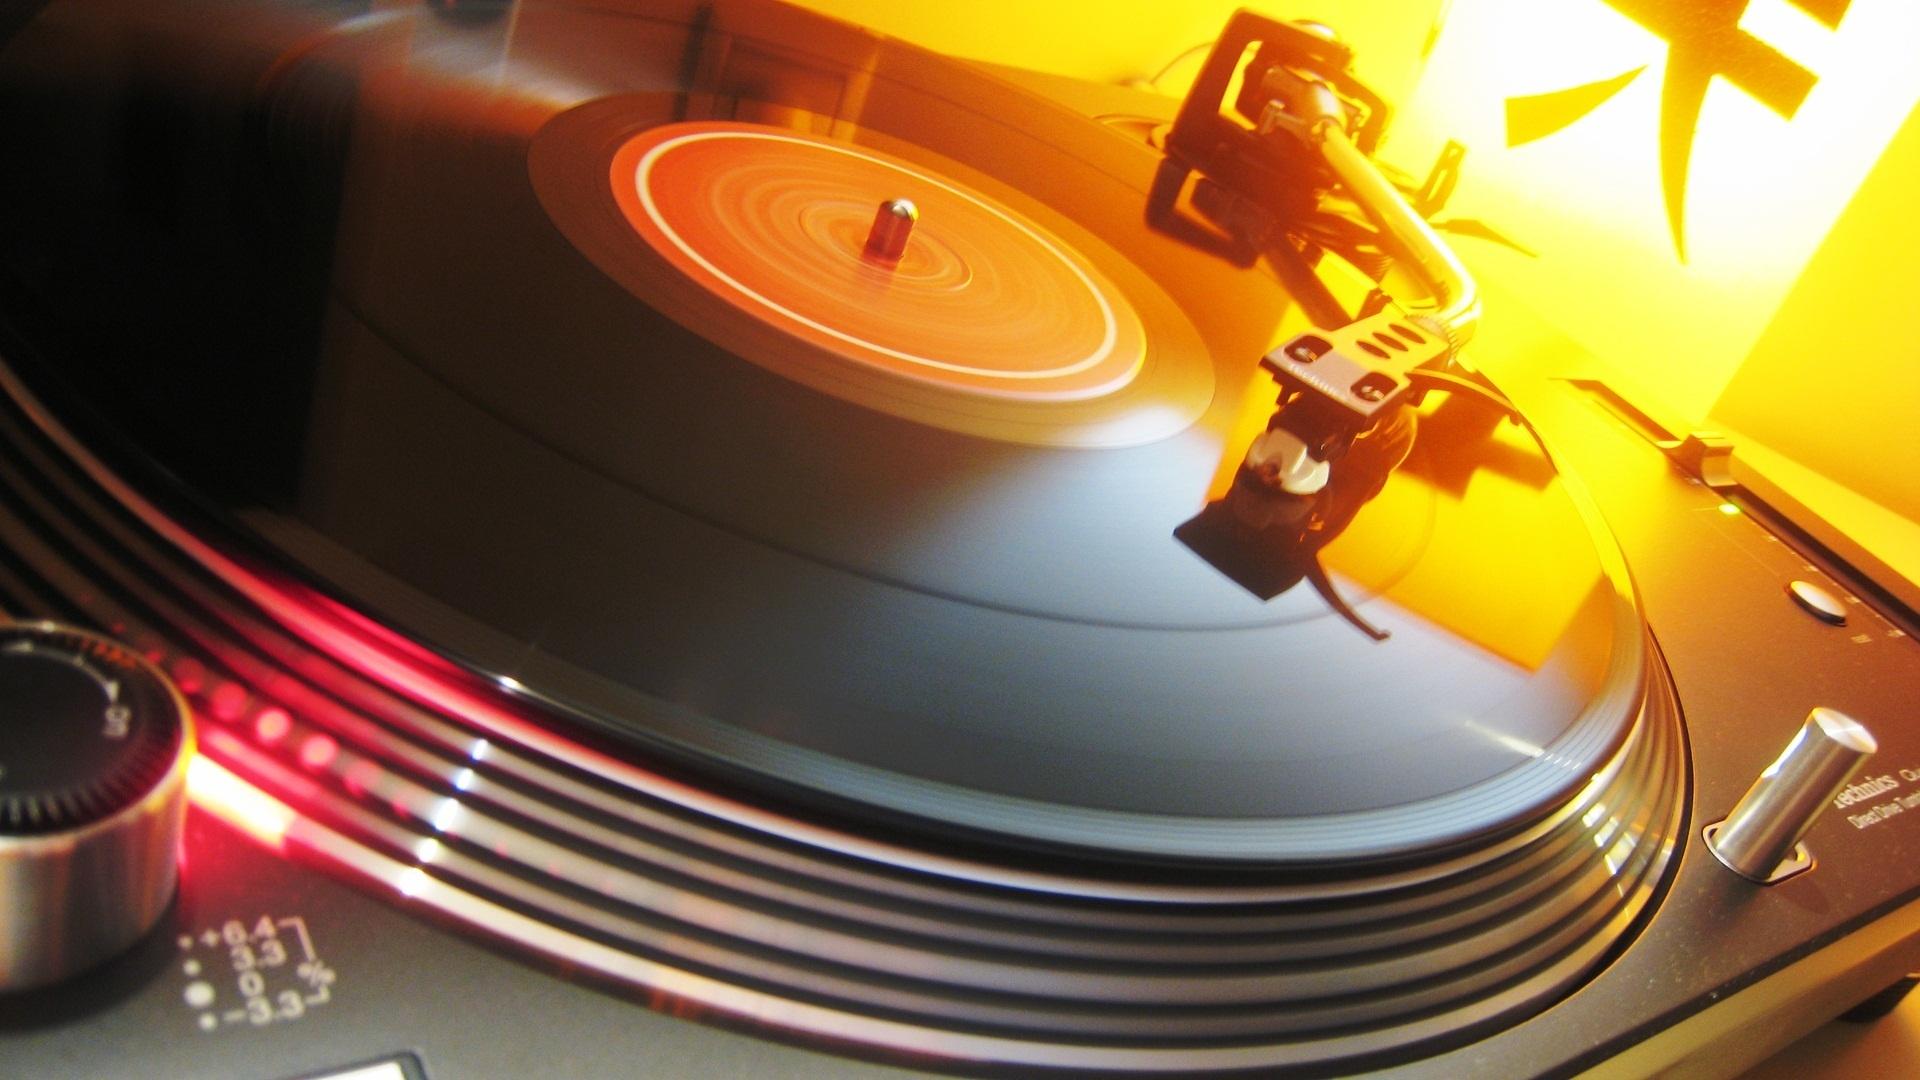 пластинка патифон музыка plate patifon music без регистрации